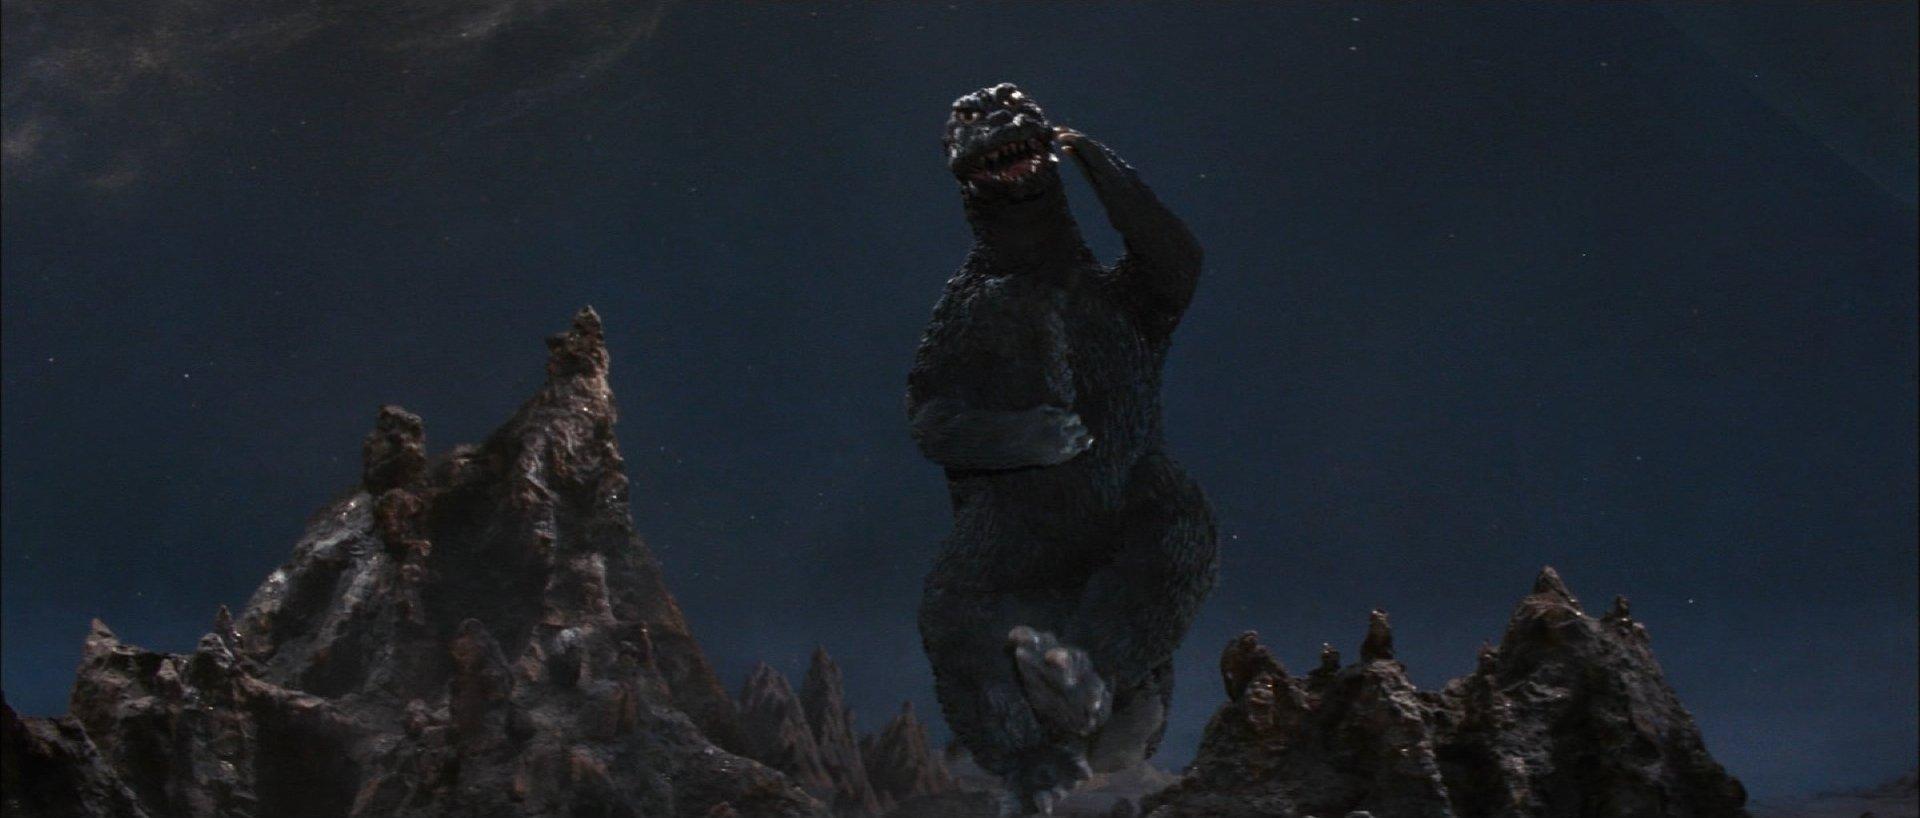 『怪獣大戦争(短縮版)』シェー!